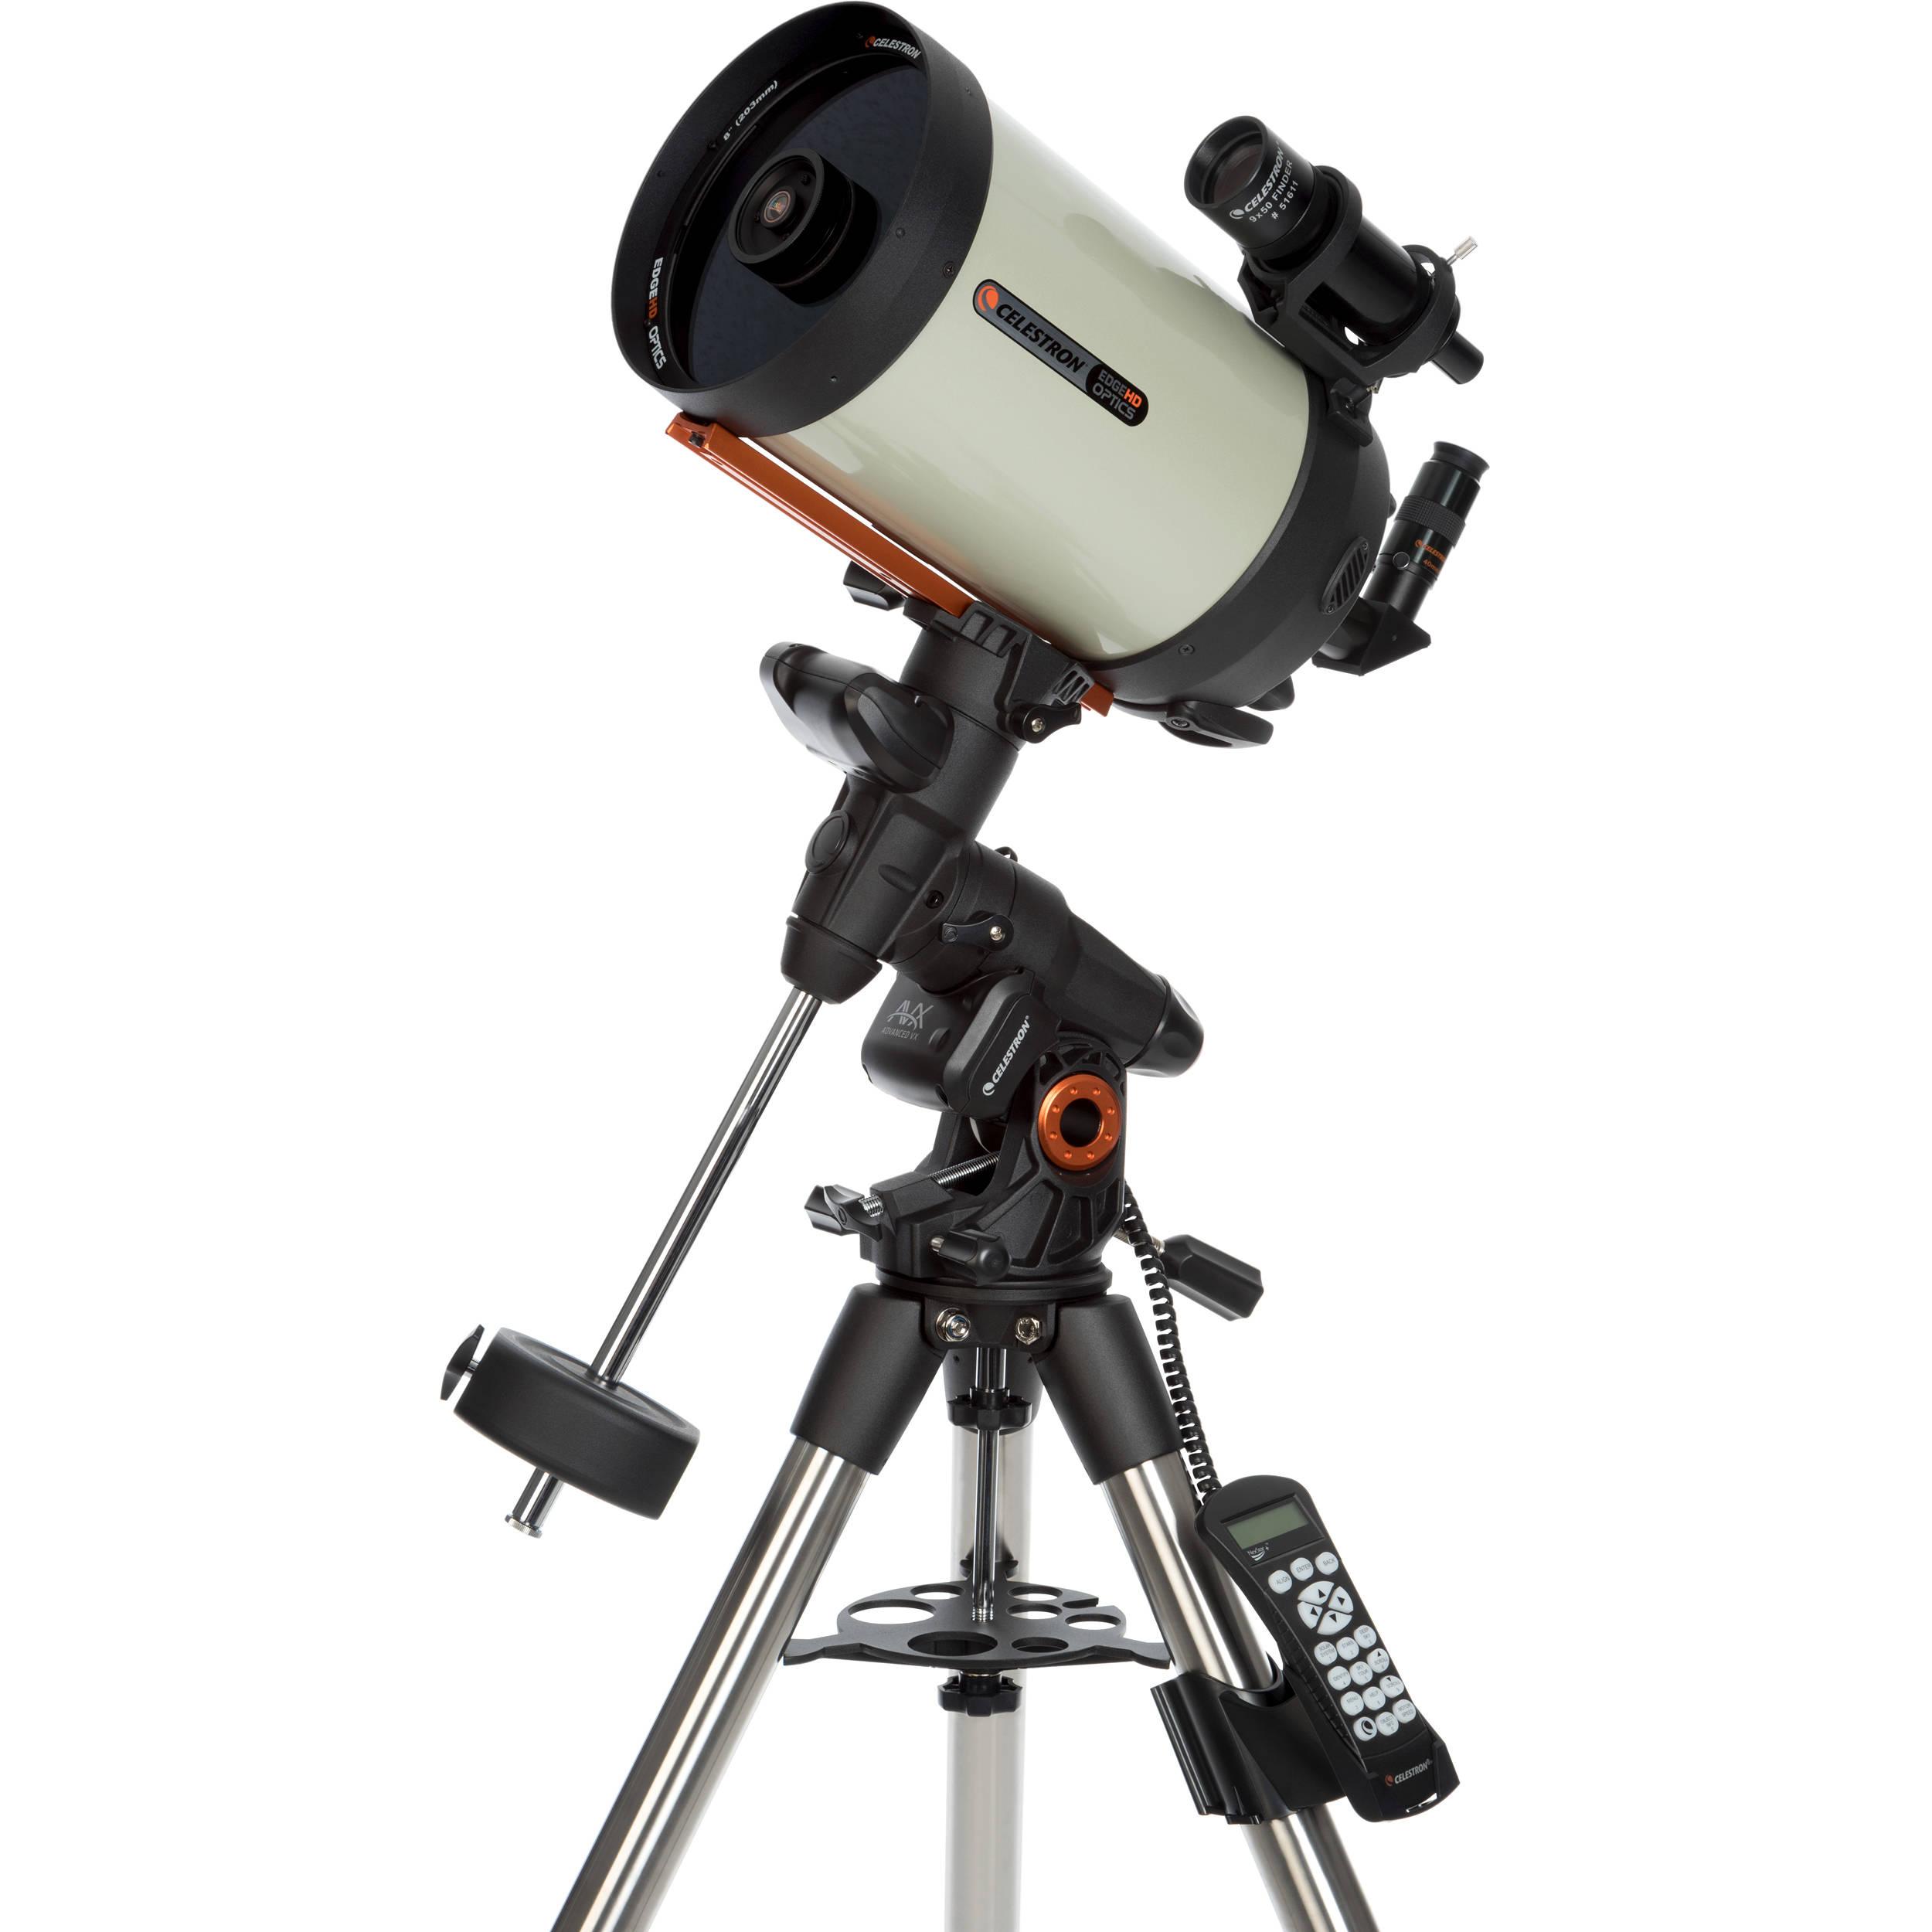 "CelestronAdvanced VX 8"" f/10 EdgeHD Schmidt-Cassegrain GoTo EQ Telescope"